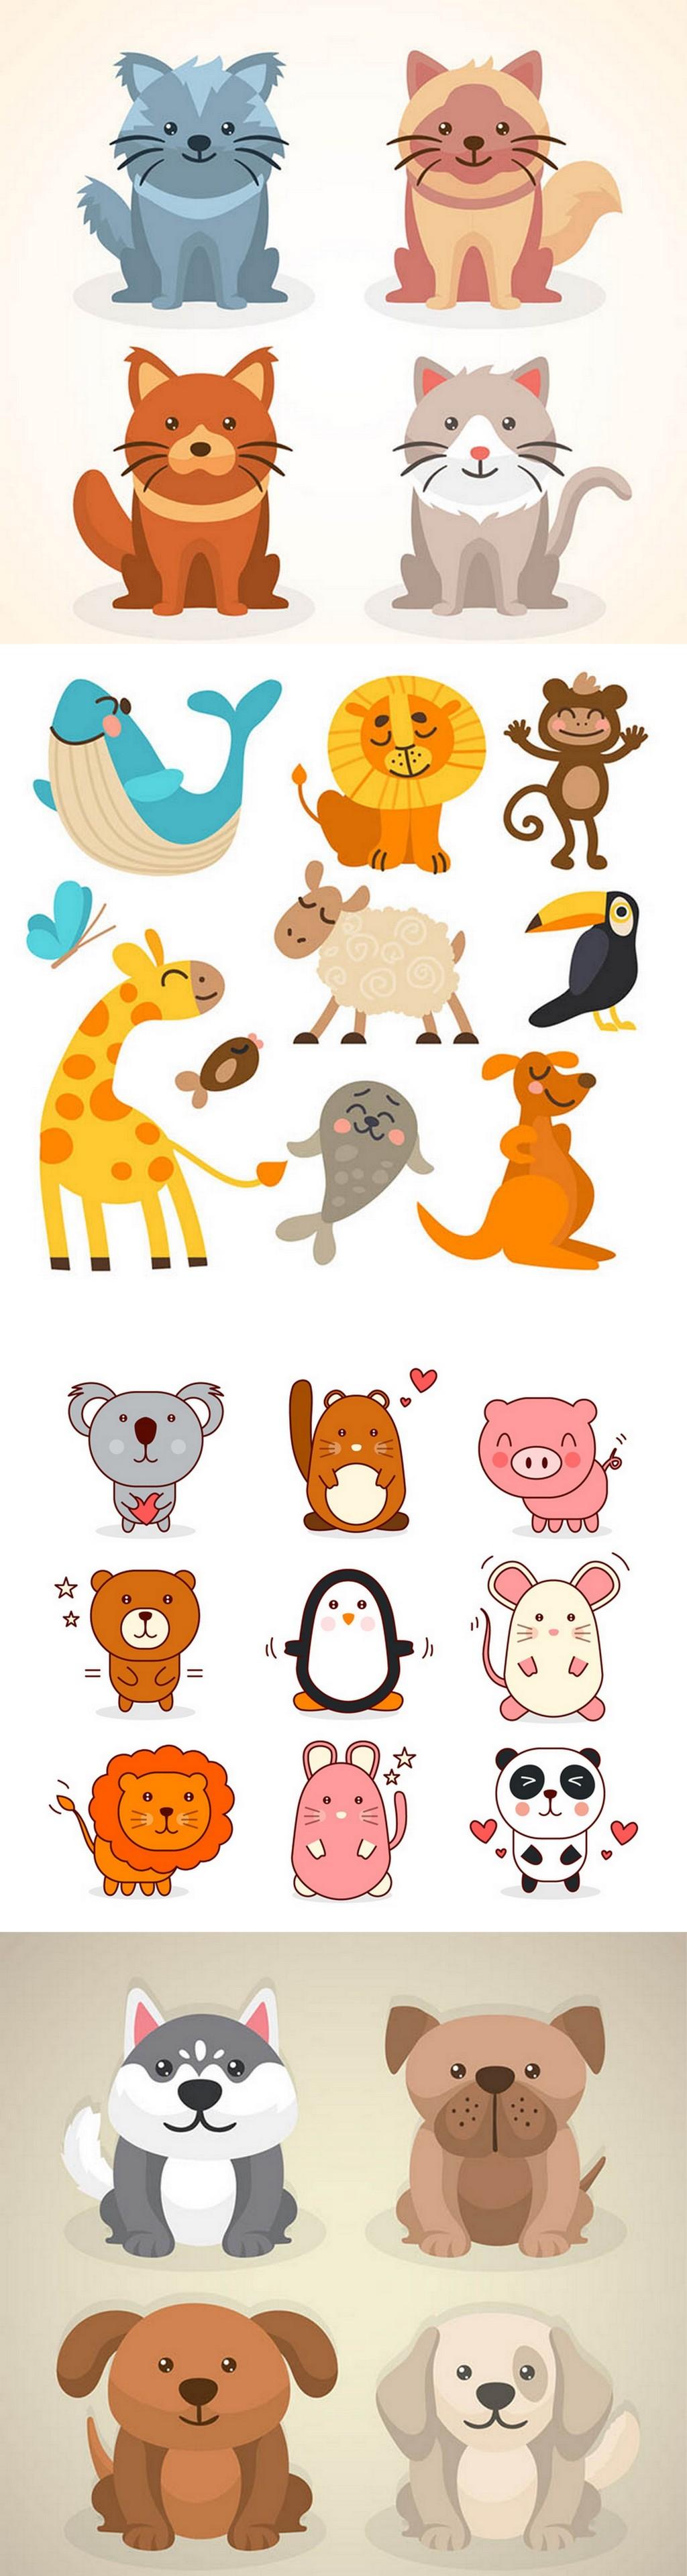 水彩手绘                                    动物